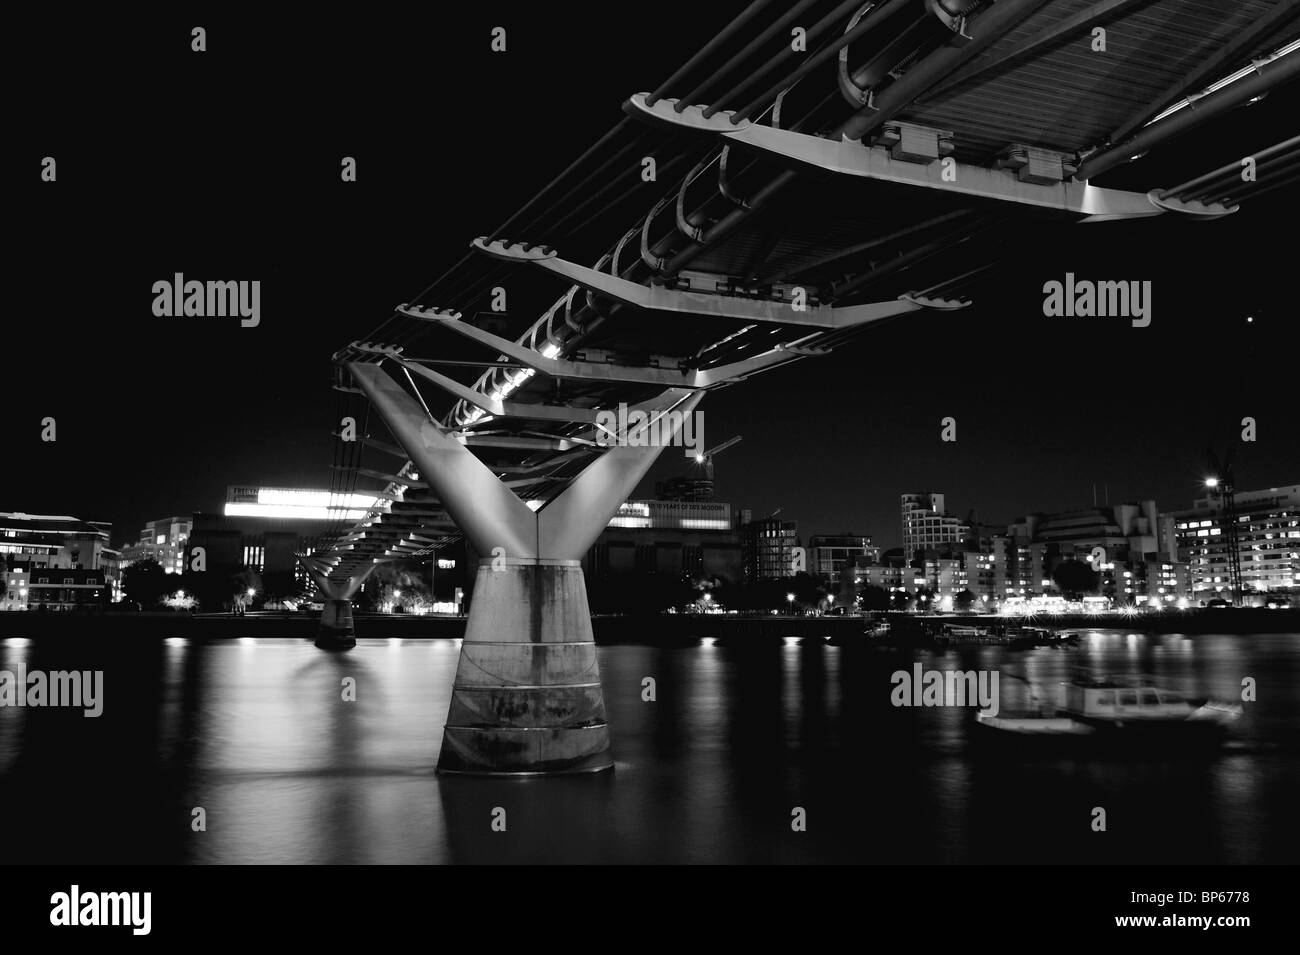 Millennium bridge at night, London - Stock Image